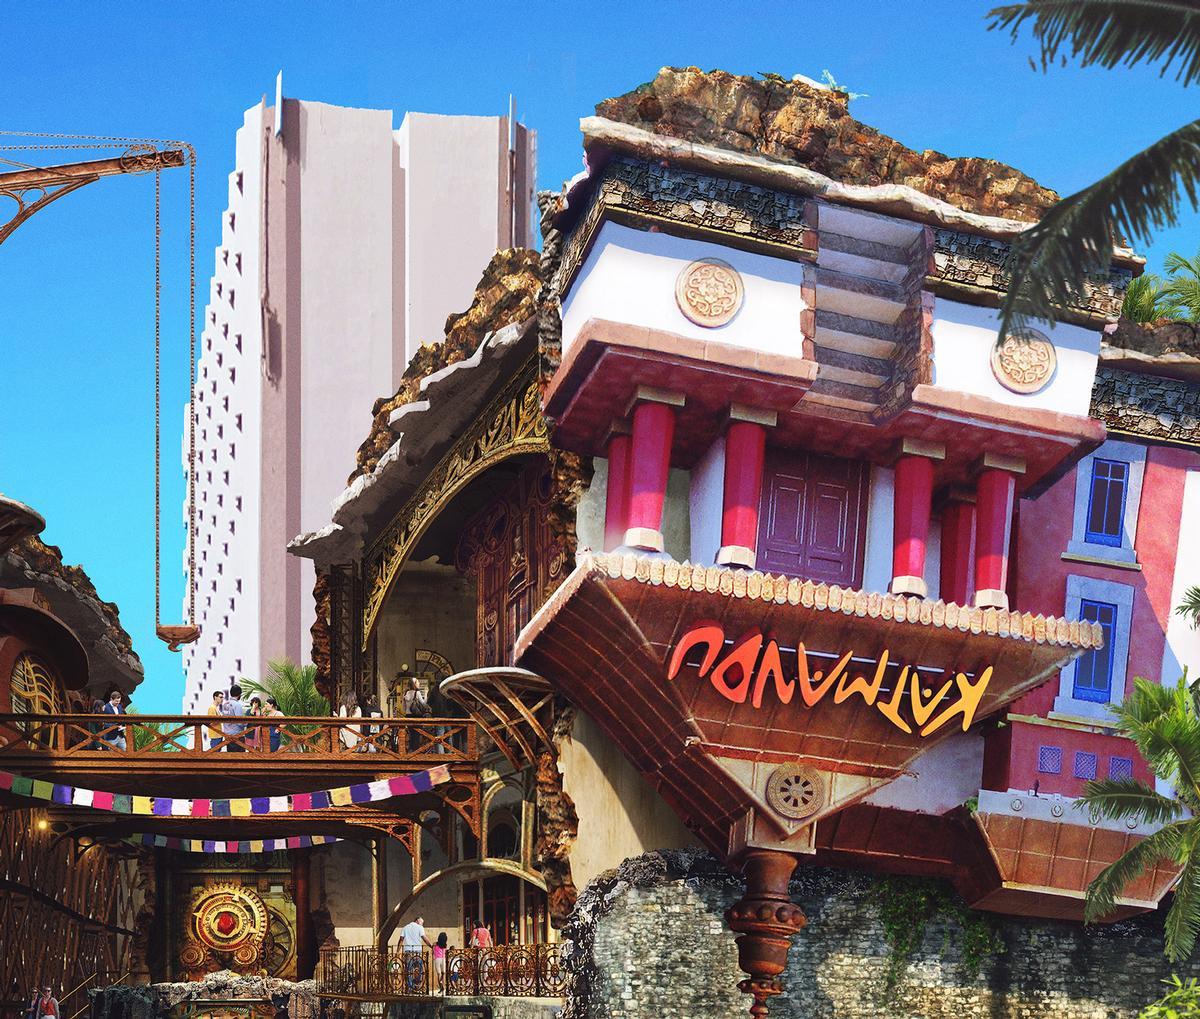 The partnership will develop new, story-based attractions utilising the Katmandu IP / Katmandu Group